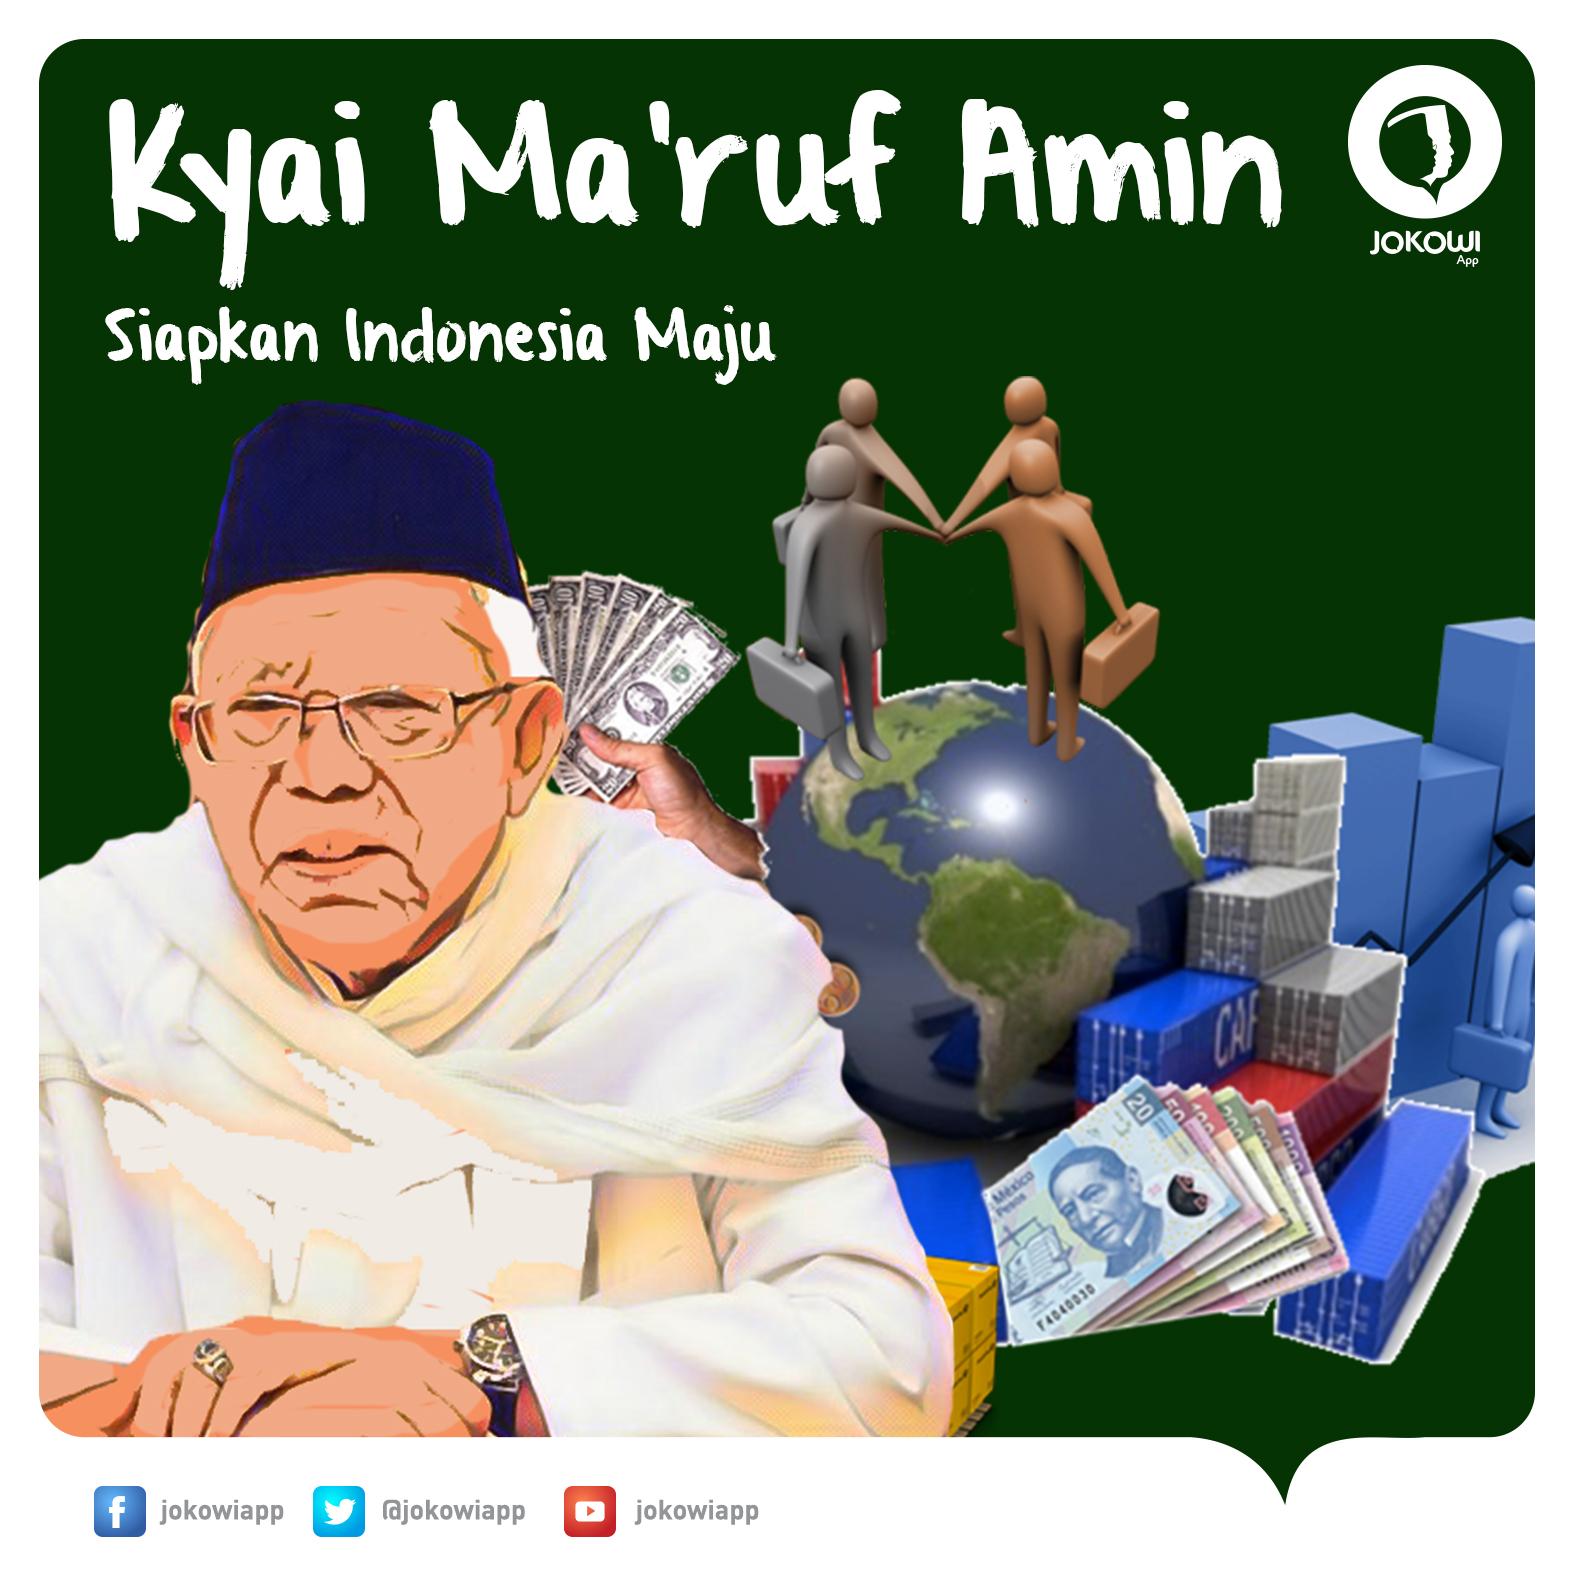 kma siapkan indonesia maju.jpg